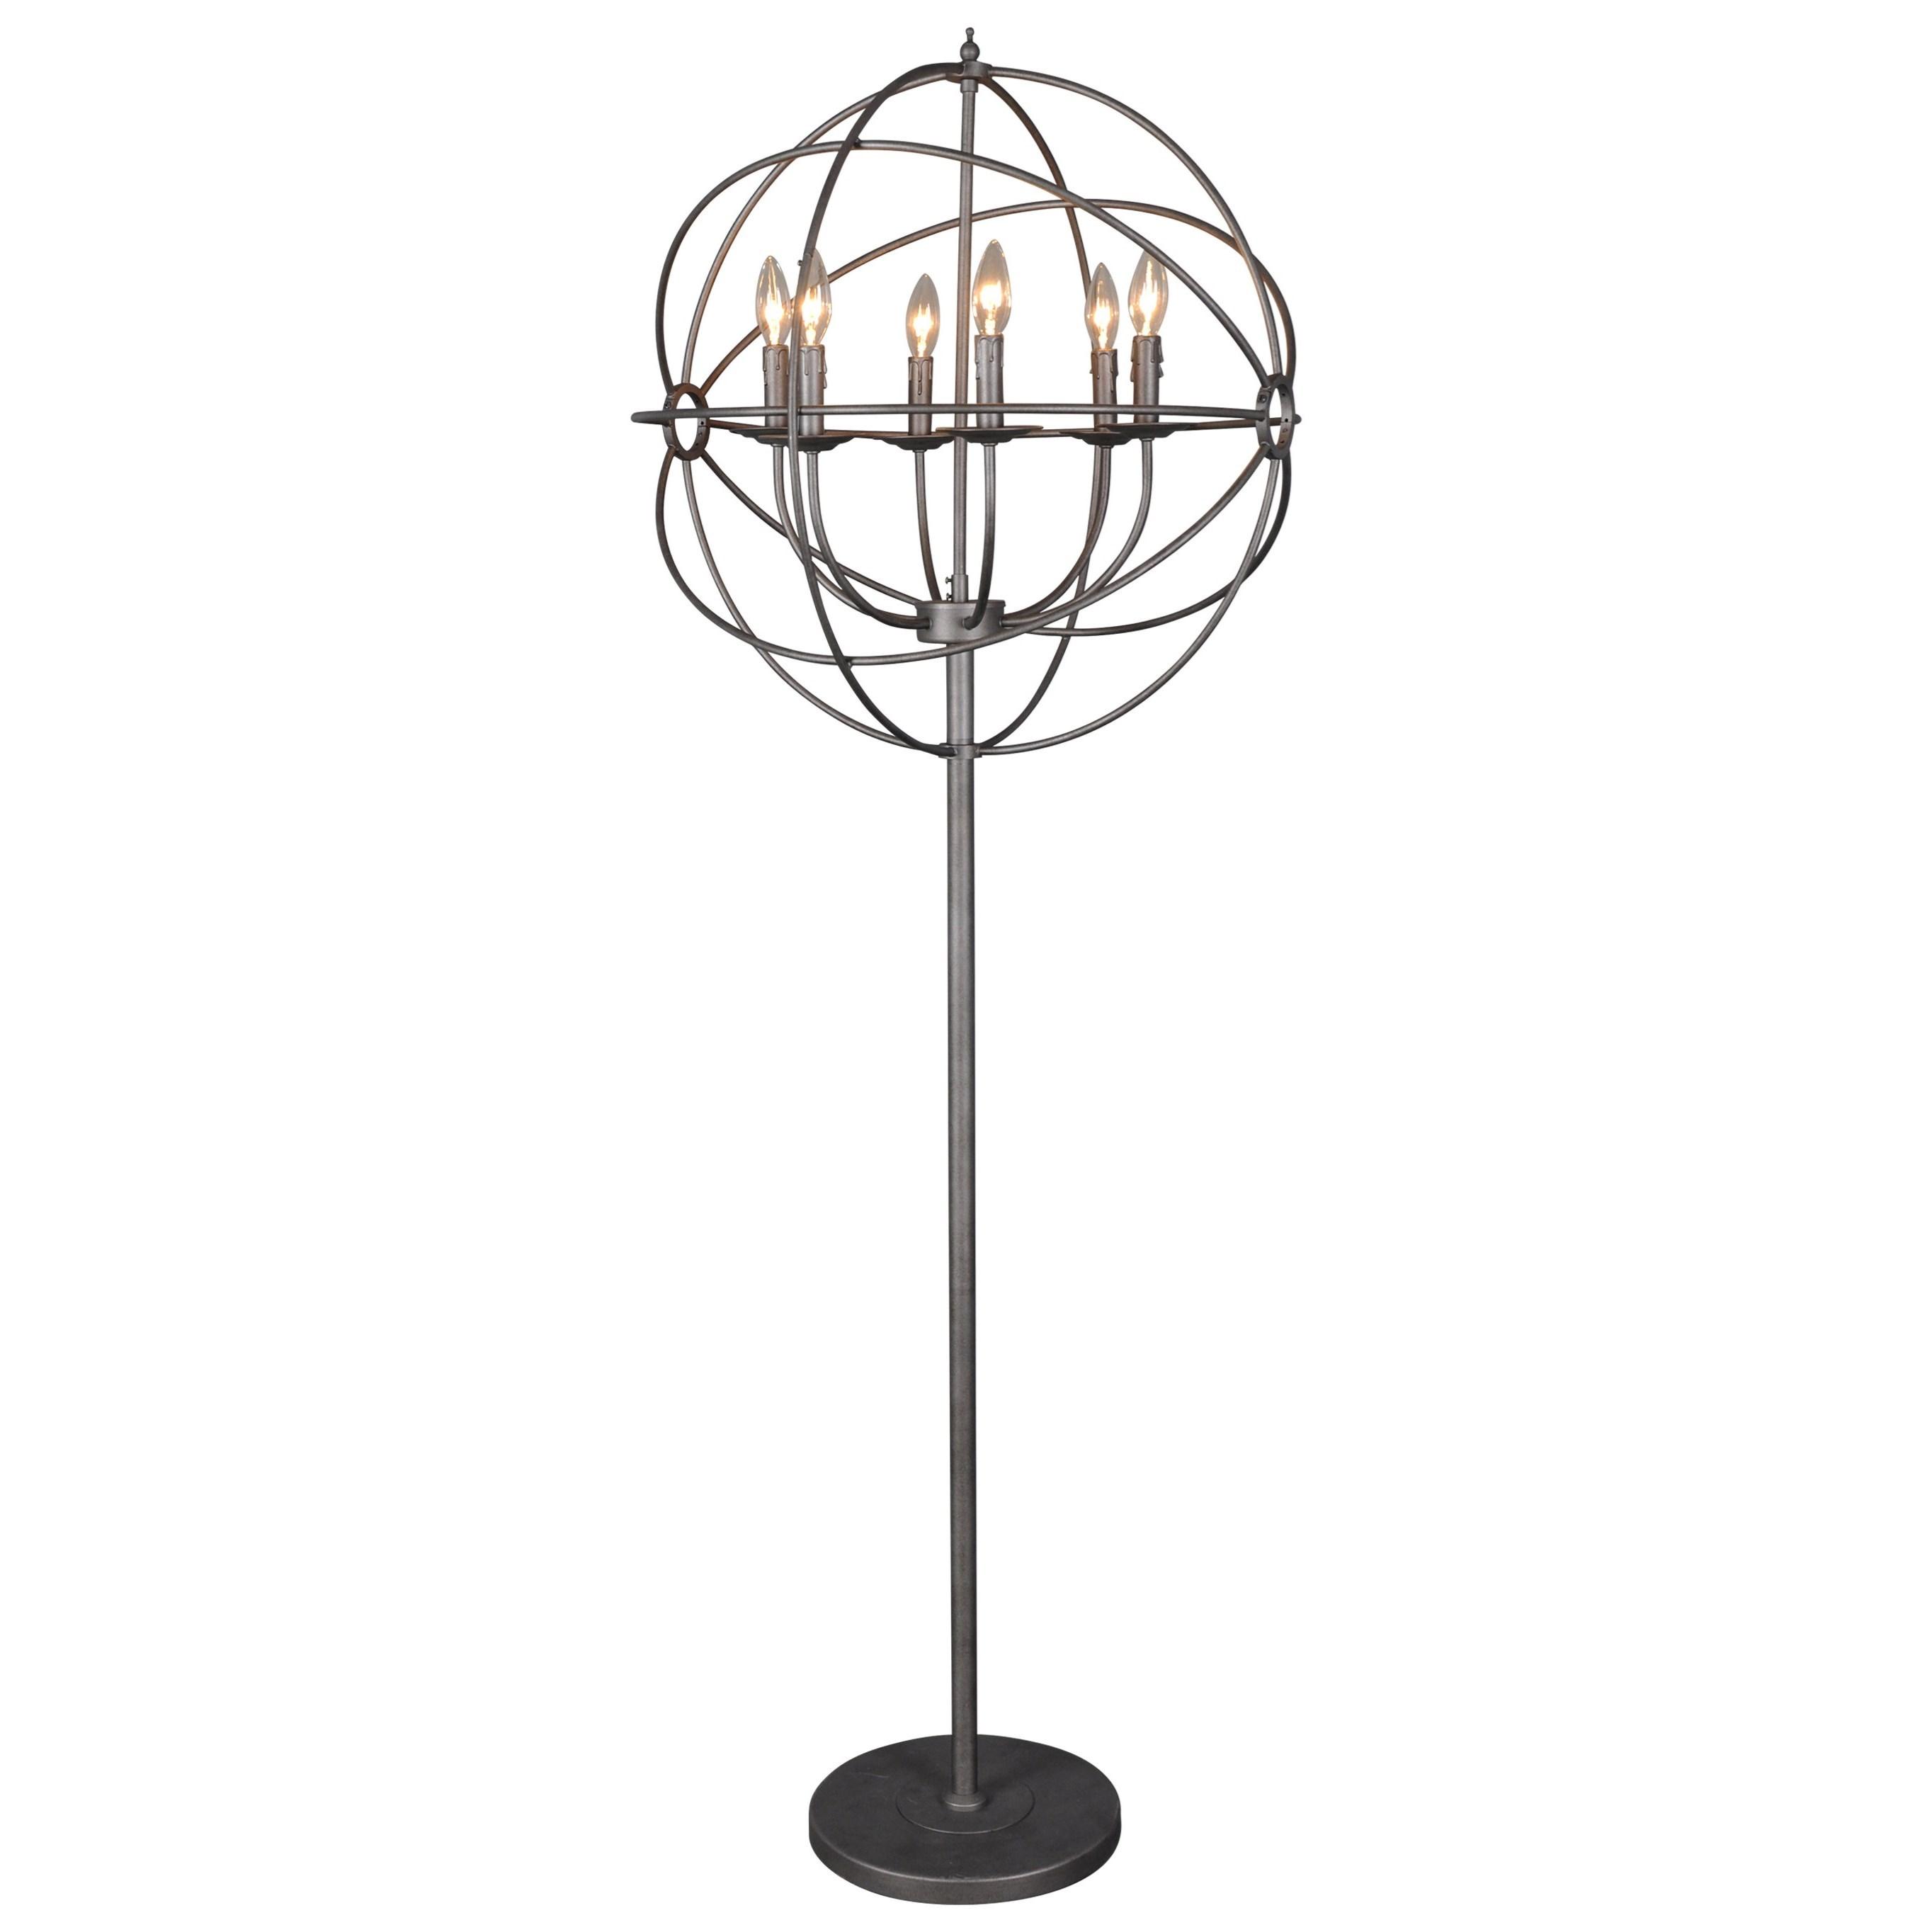 Moe S Home Collection Lighting Rossana Floor Lamp